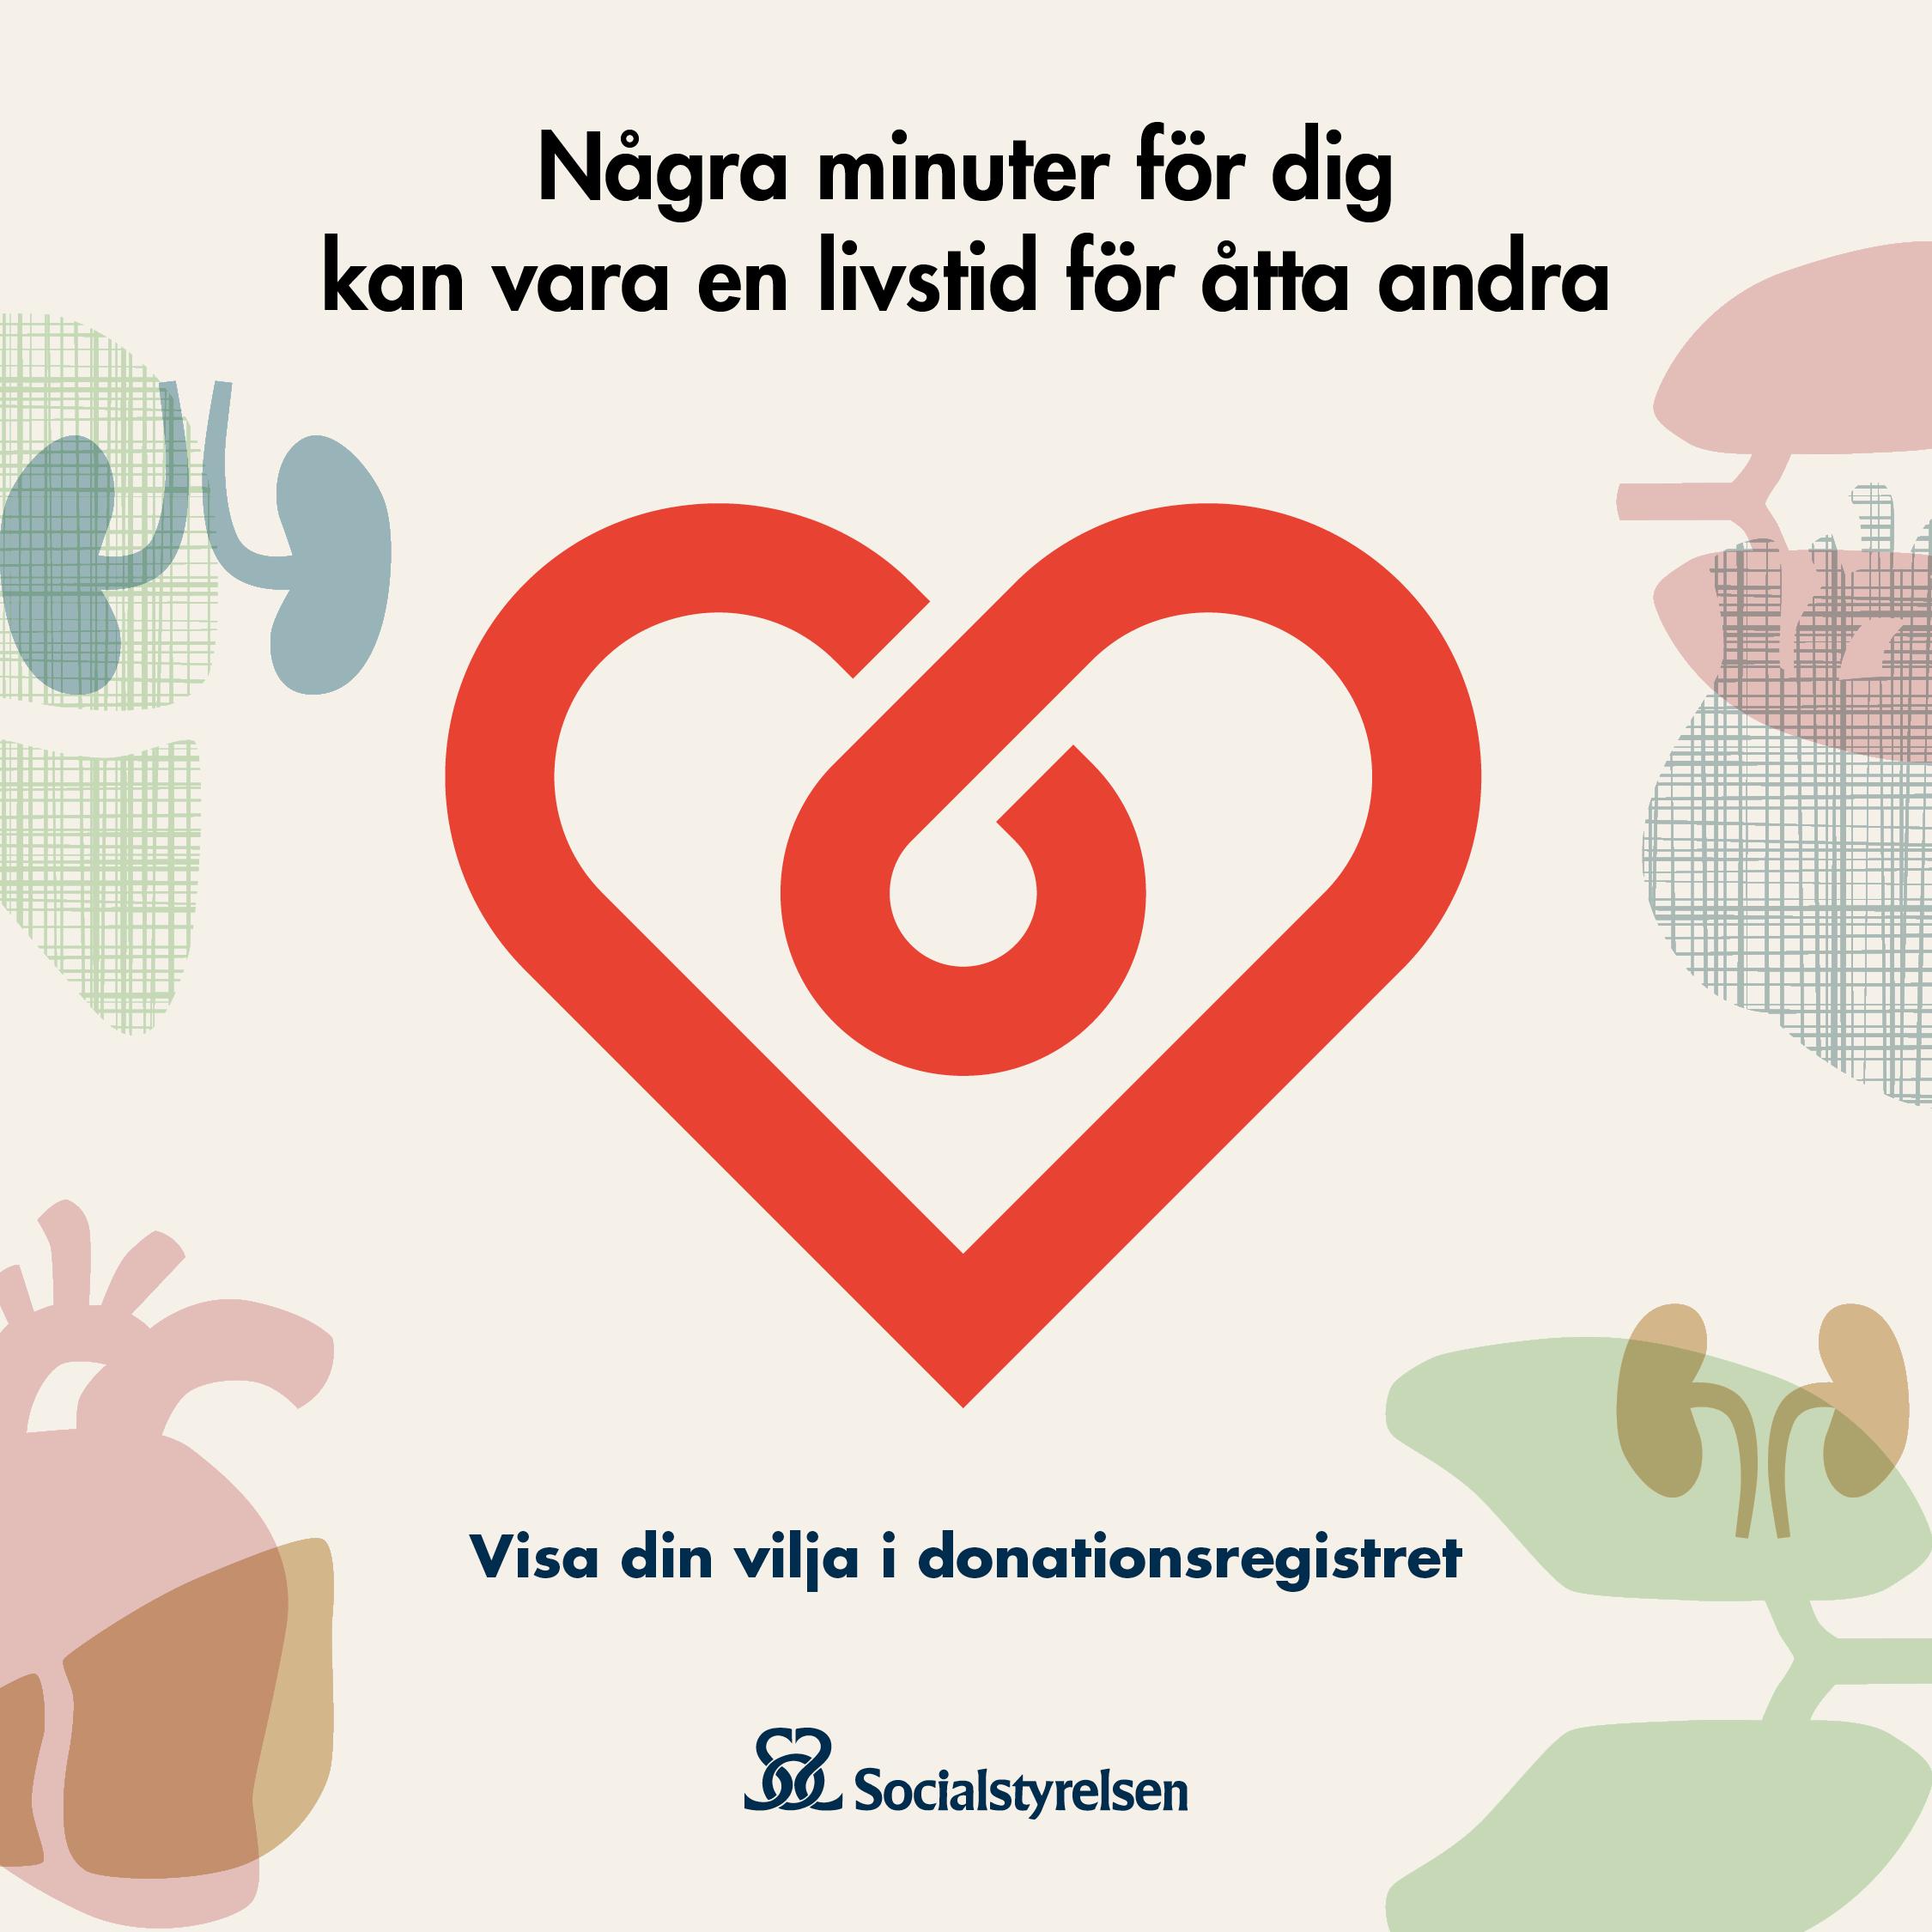 Visa din vilja i donationsregistret